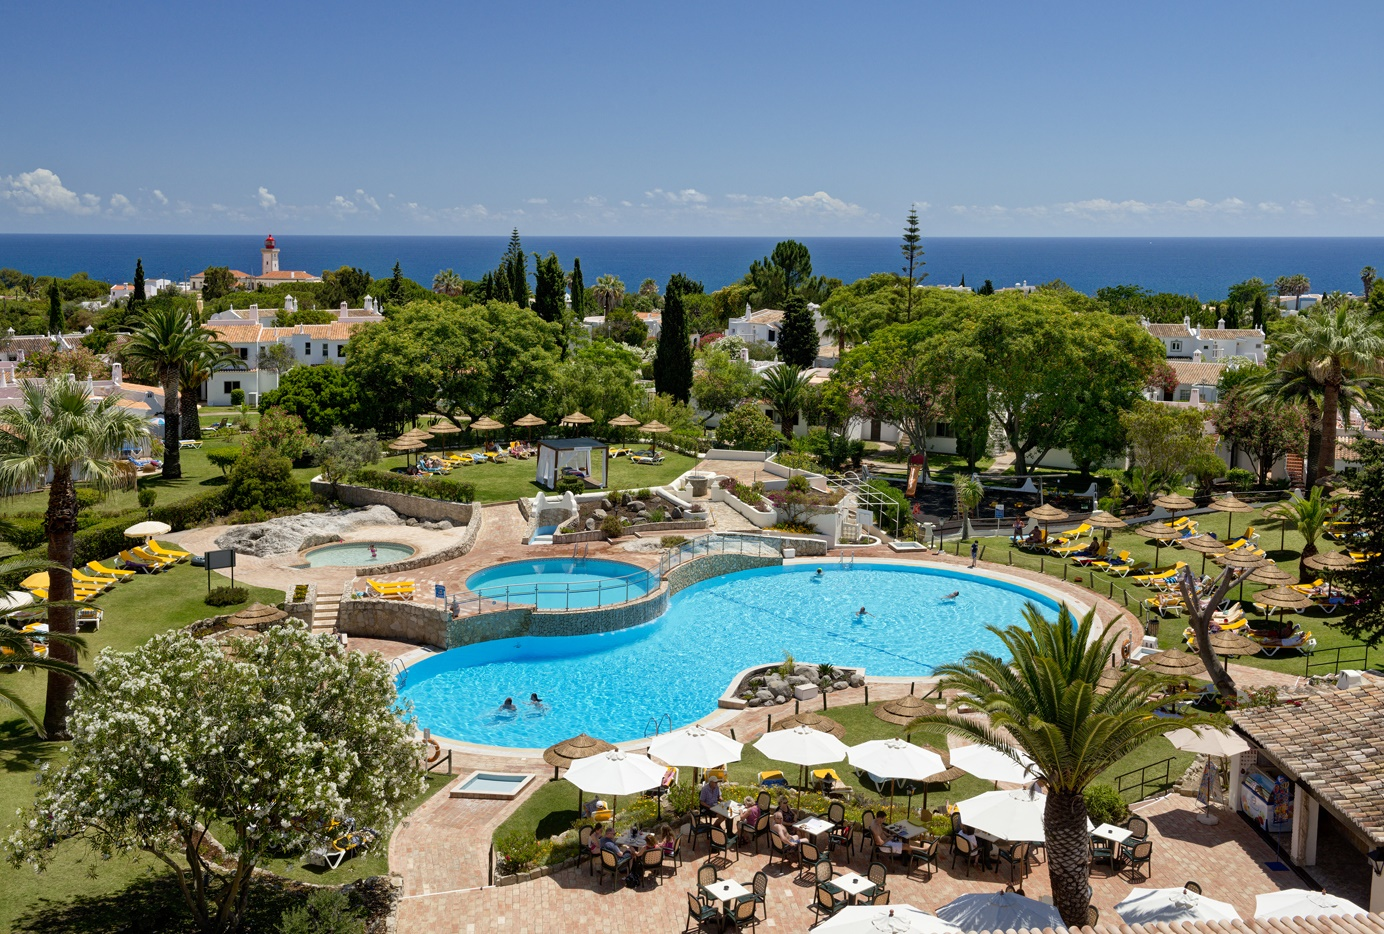 All Inclusive Sun Holidays to Rocha Brava Village Resort